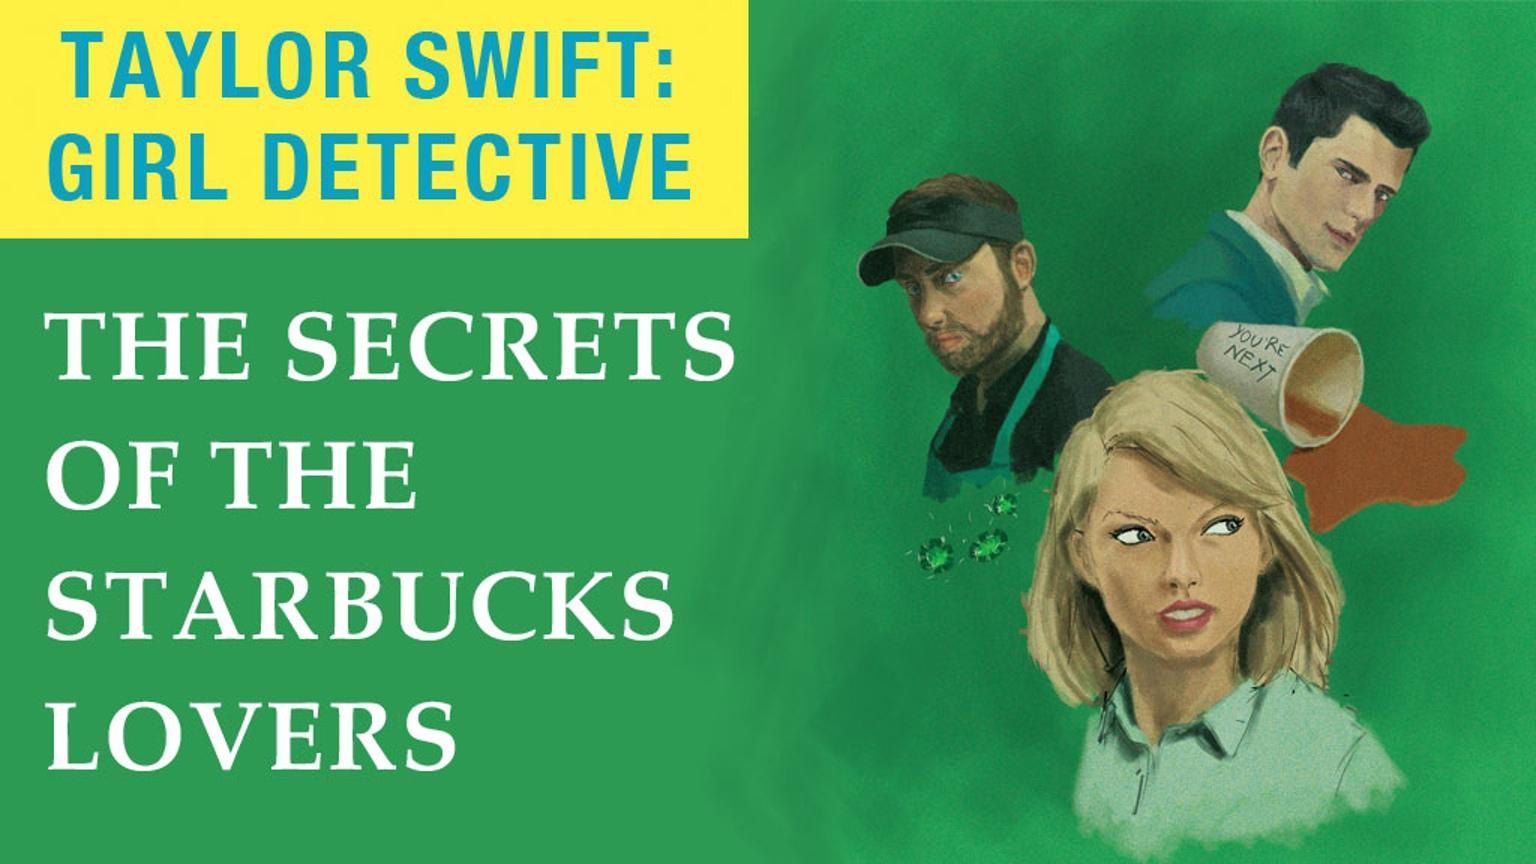 Taylor Sift Graphice Novel, Courtesy of Kickstarter